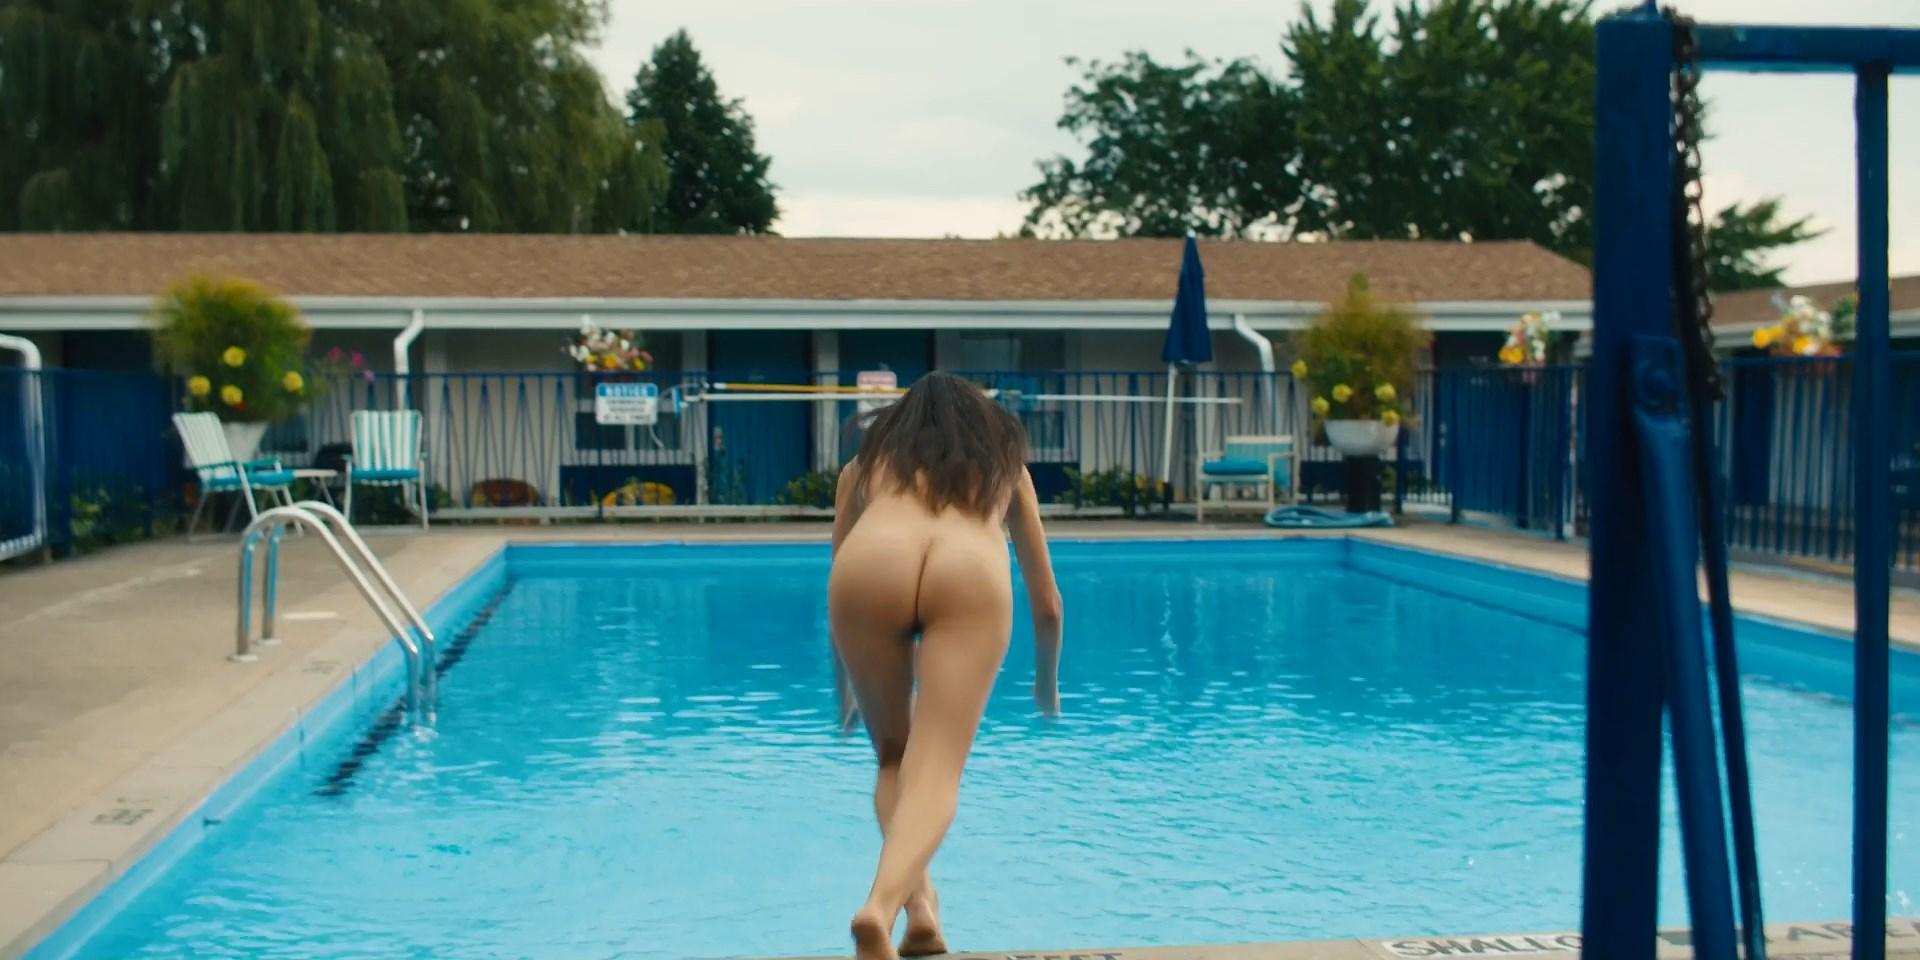 Elena Anaya nude - Jett s01e02 (2019)